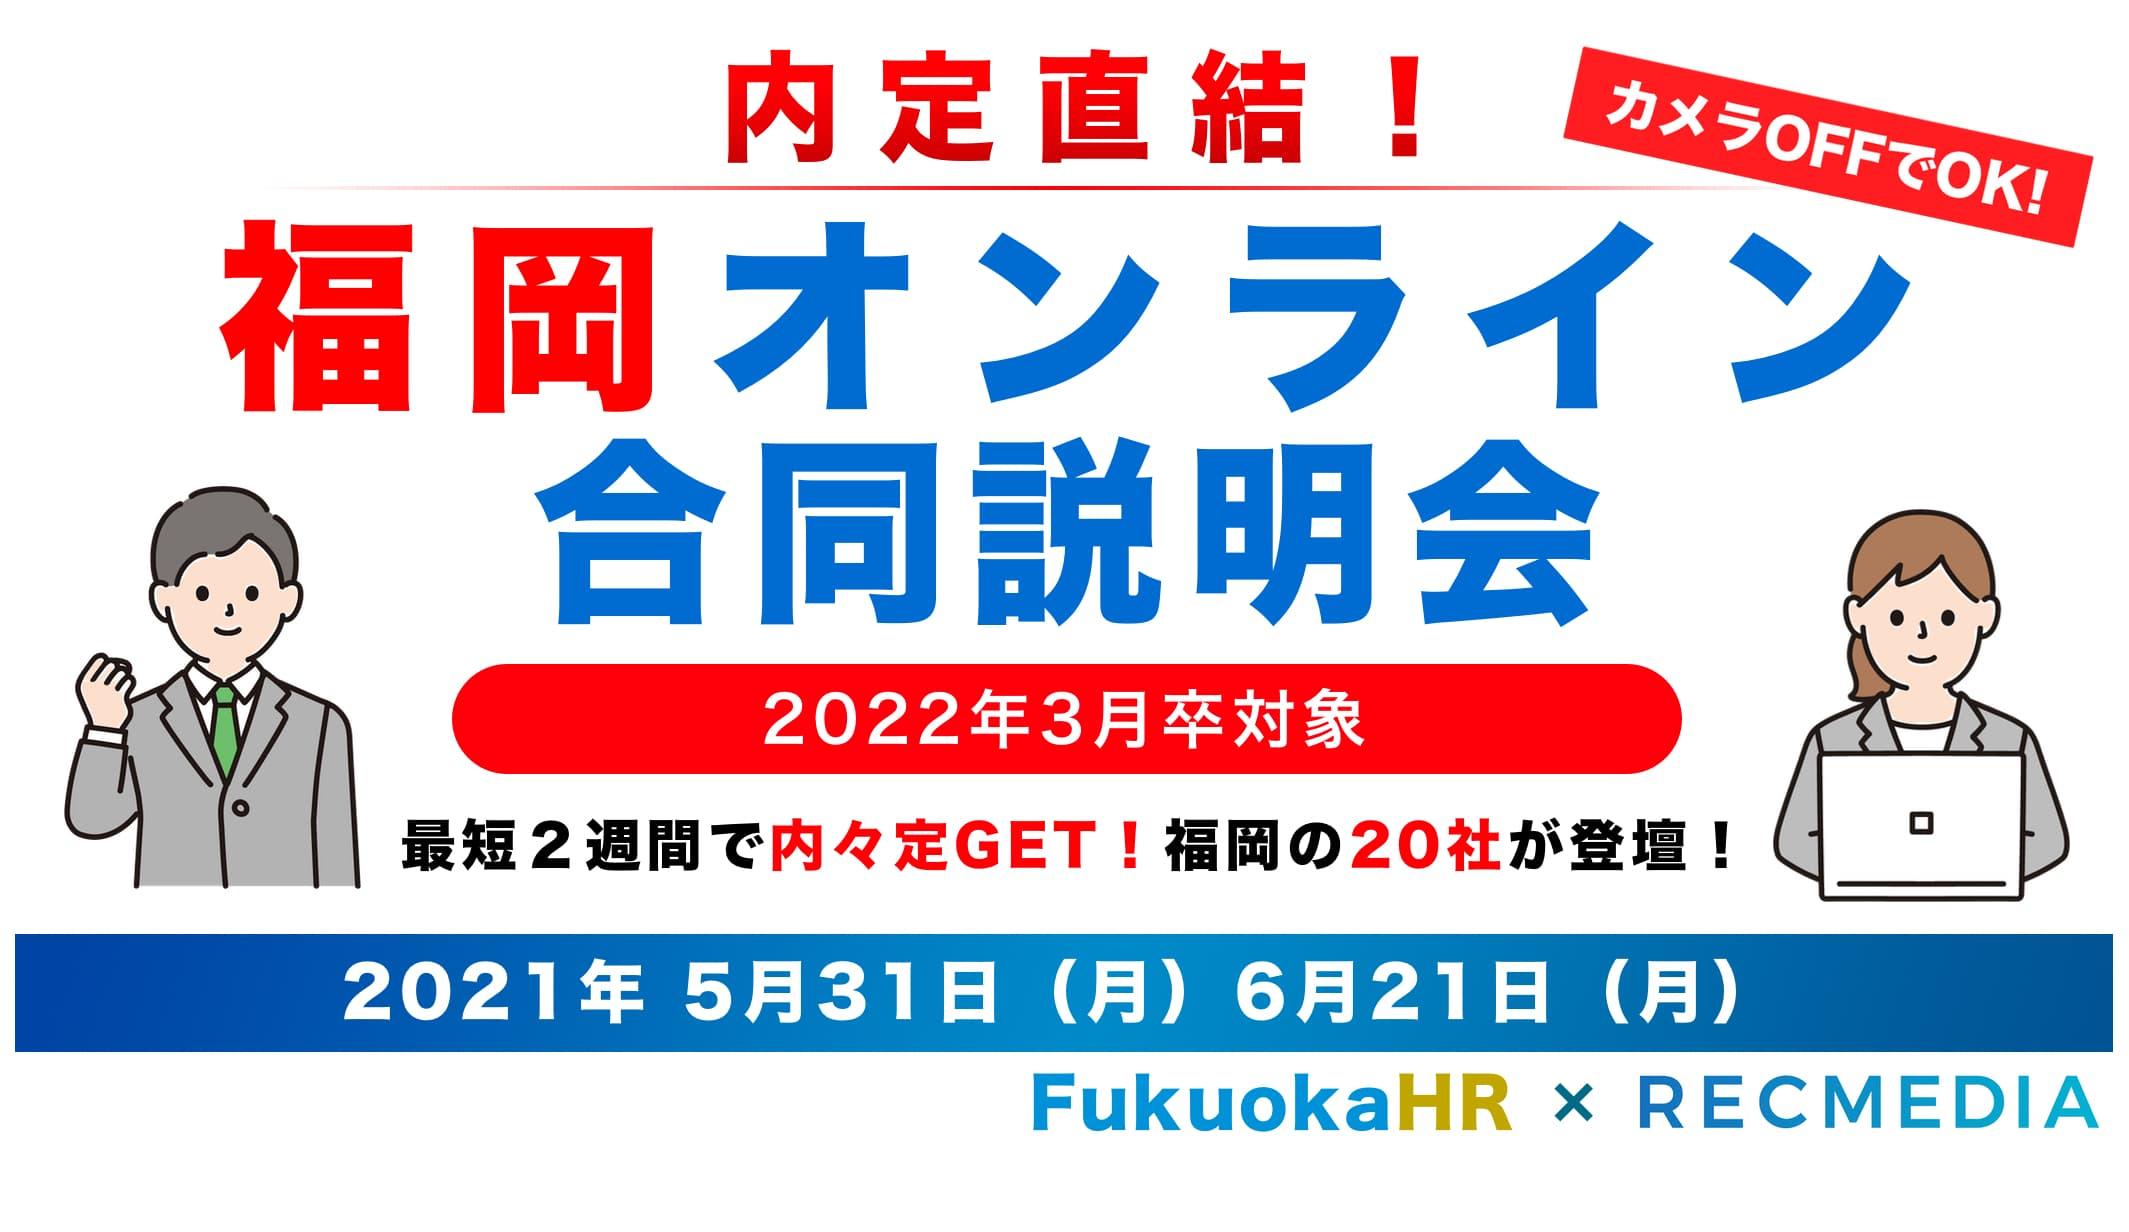 Fukuoka22 last min